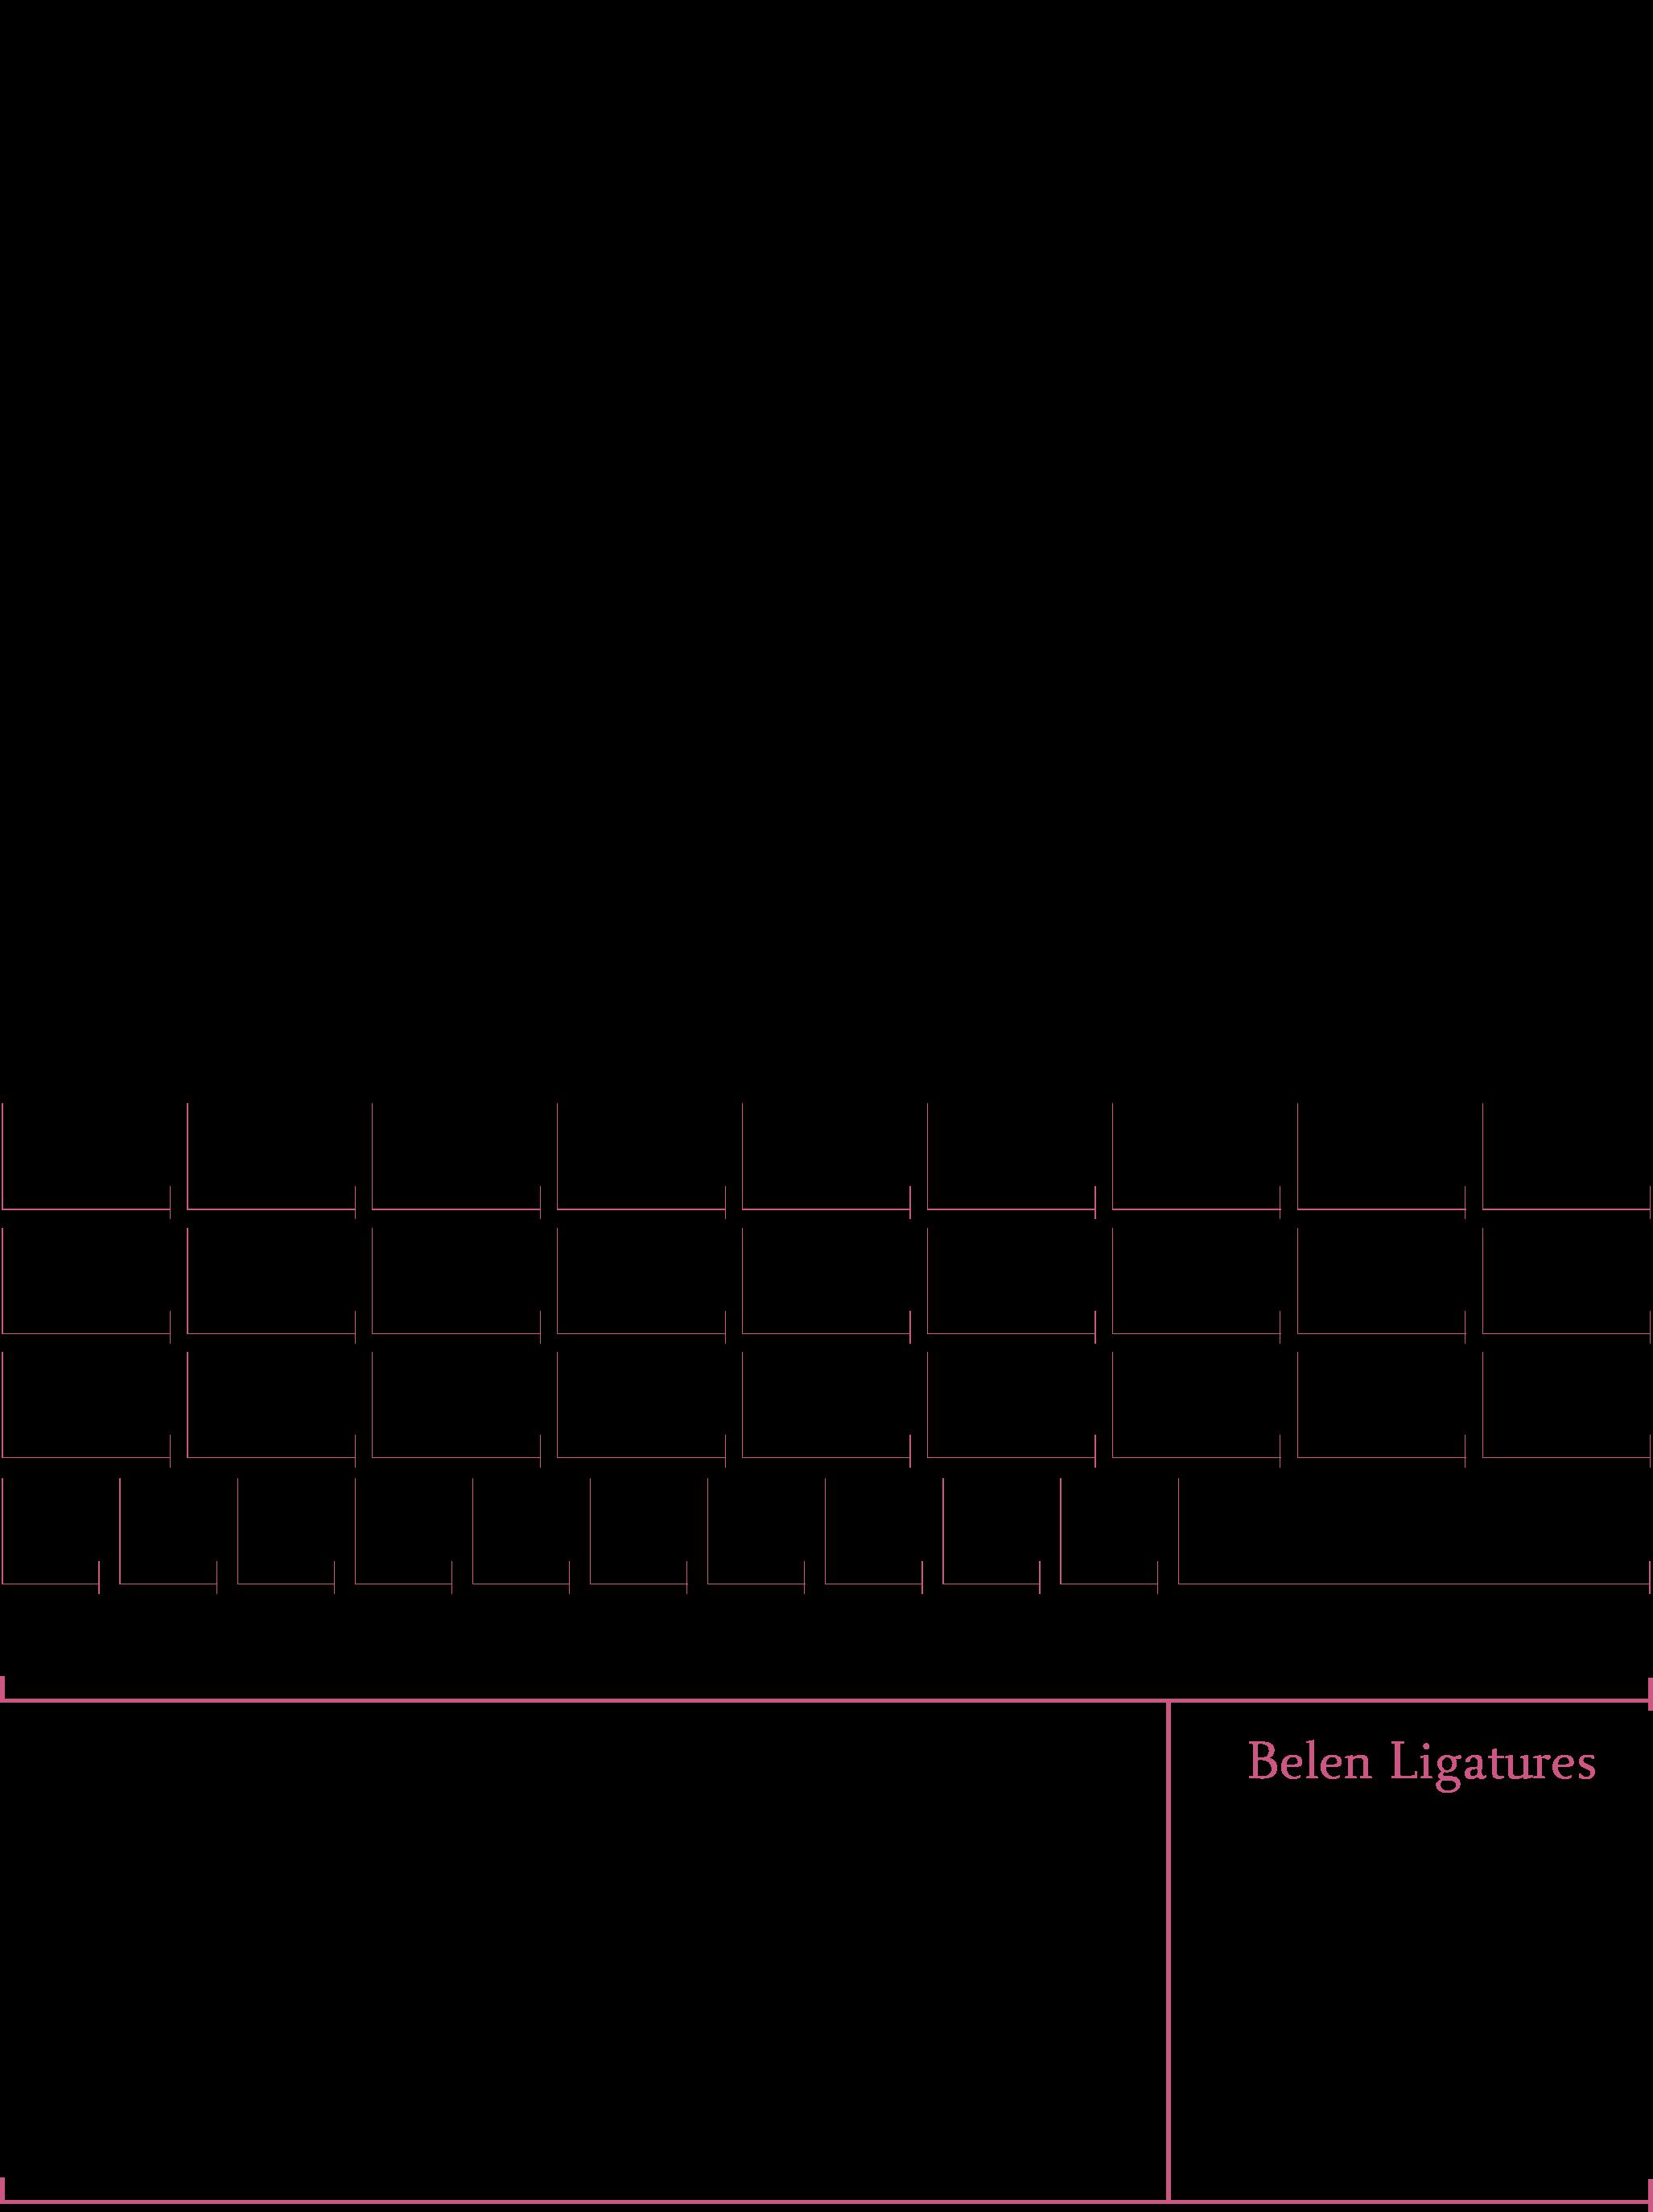 Belen_k-billboard